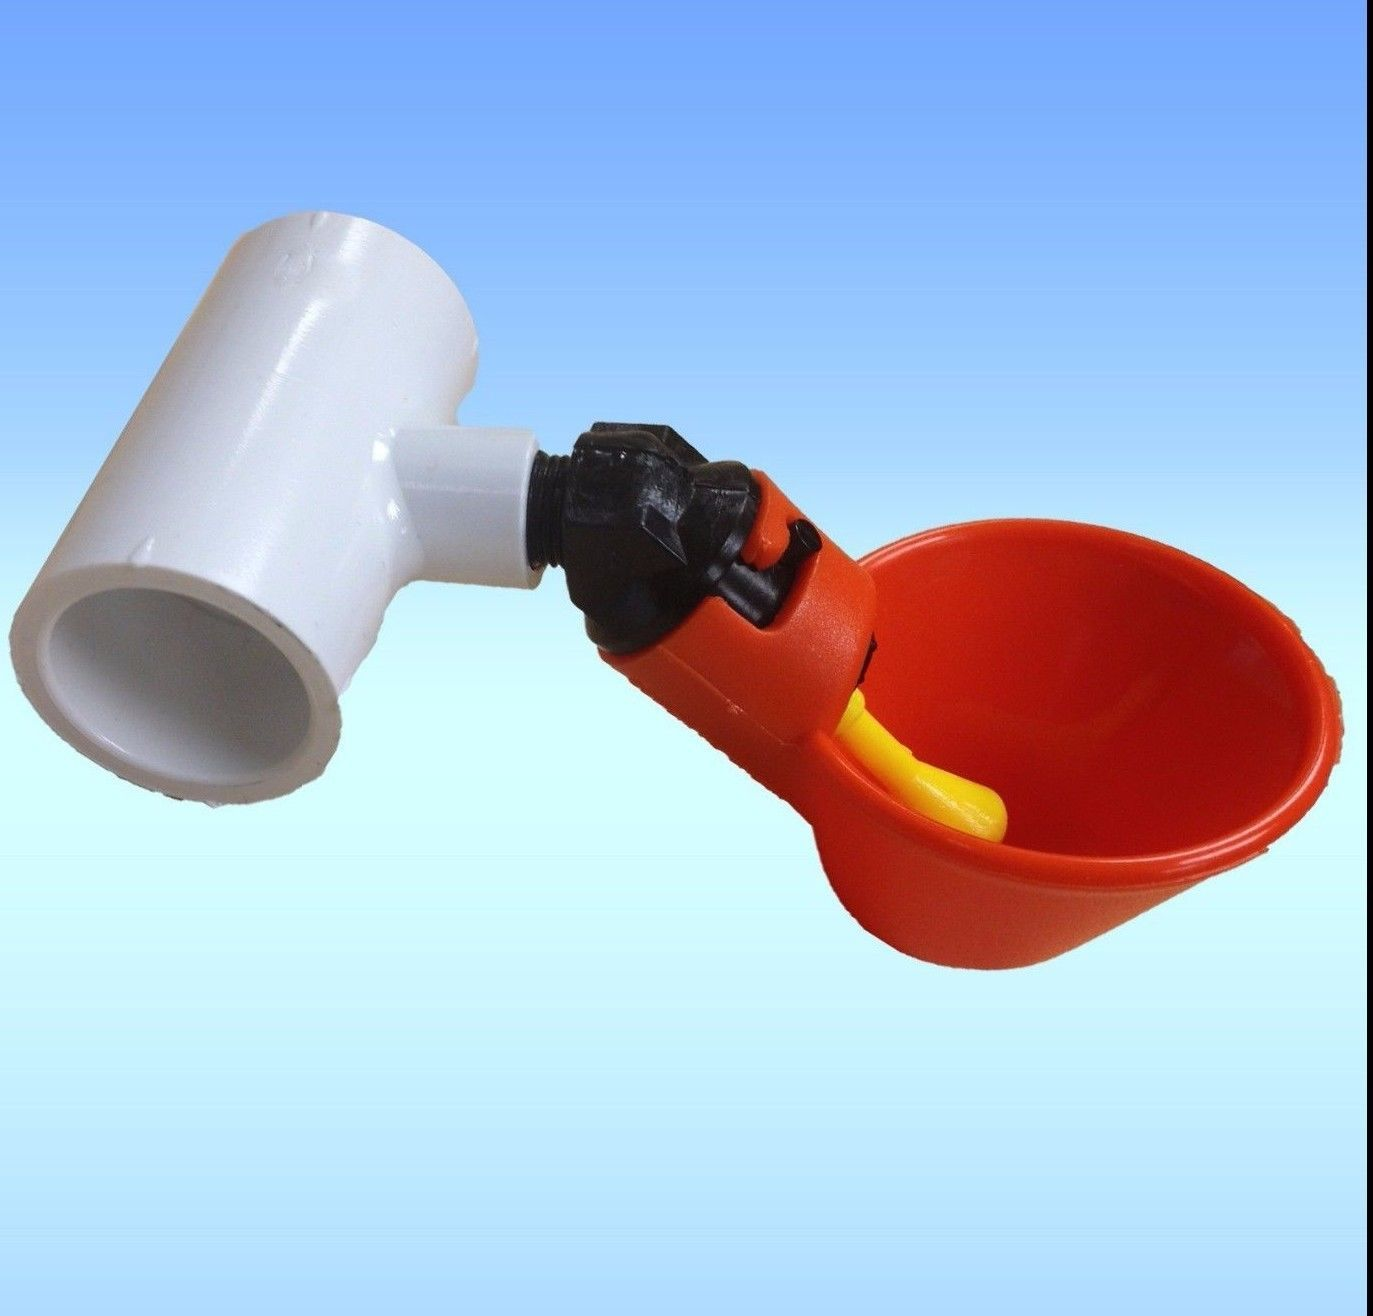 12 95 3 Poultry Water Drinking Cups Pvc Tee Fittings Chicken Drinker Beaktime Farm Ebay Home Garden Poultry Supplies Backyard Poultry Poultry